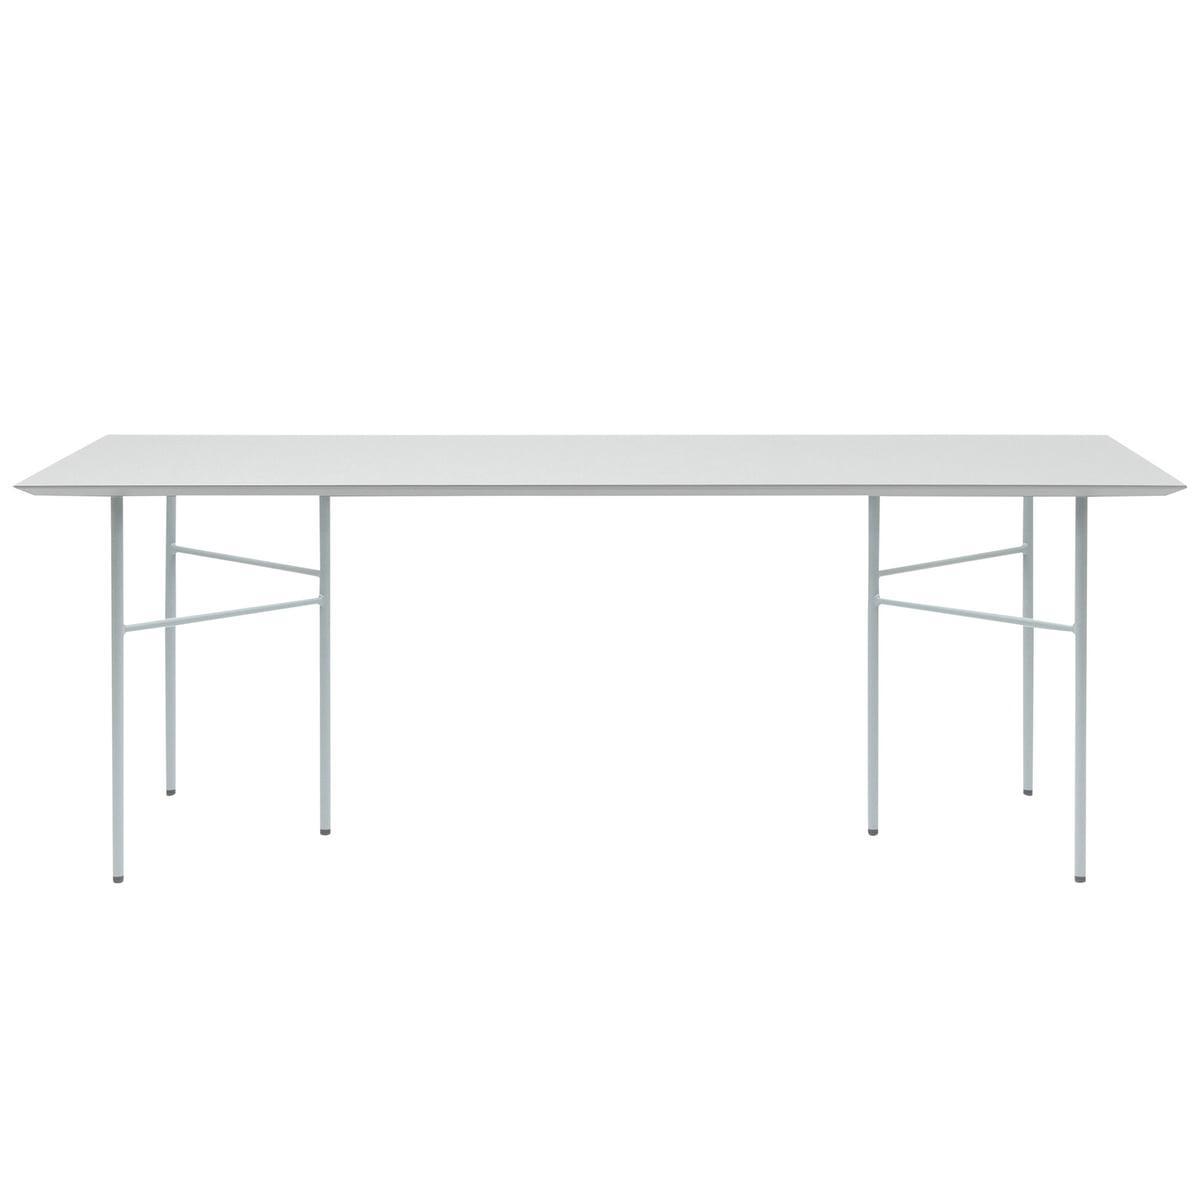 mingle tabletop linoleum by ferm living connox. Black Bedroom Furniture Sets. Home Design Ideas